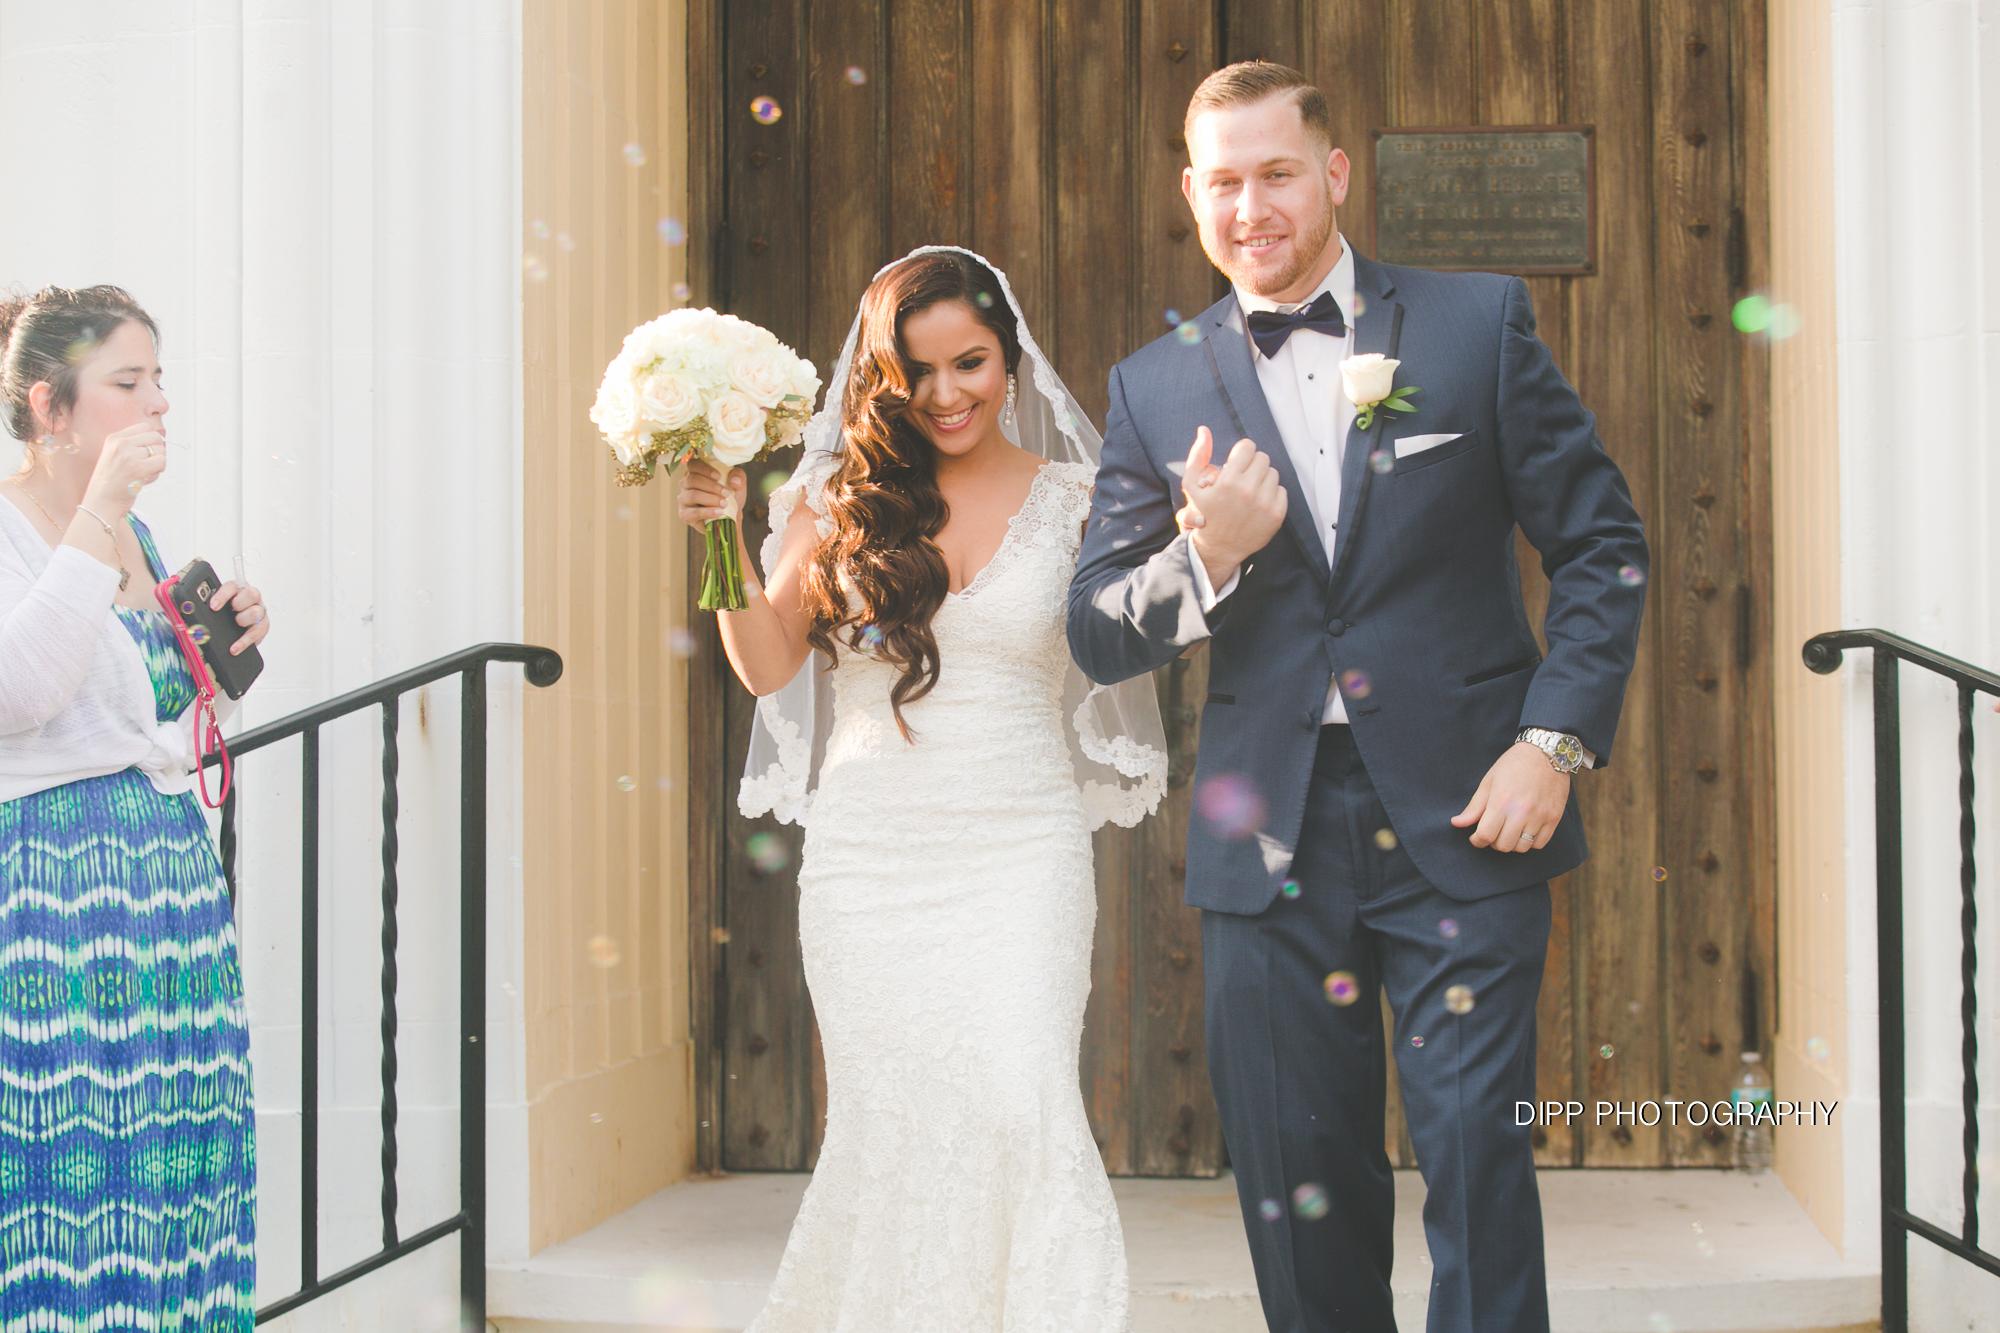 Dipp_2016 EDITED Melissa & Avilio Wedding-284